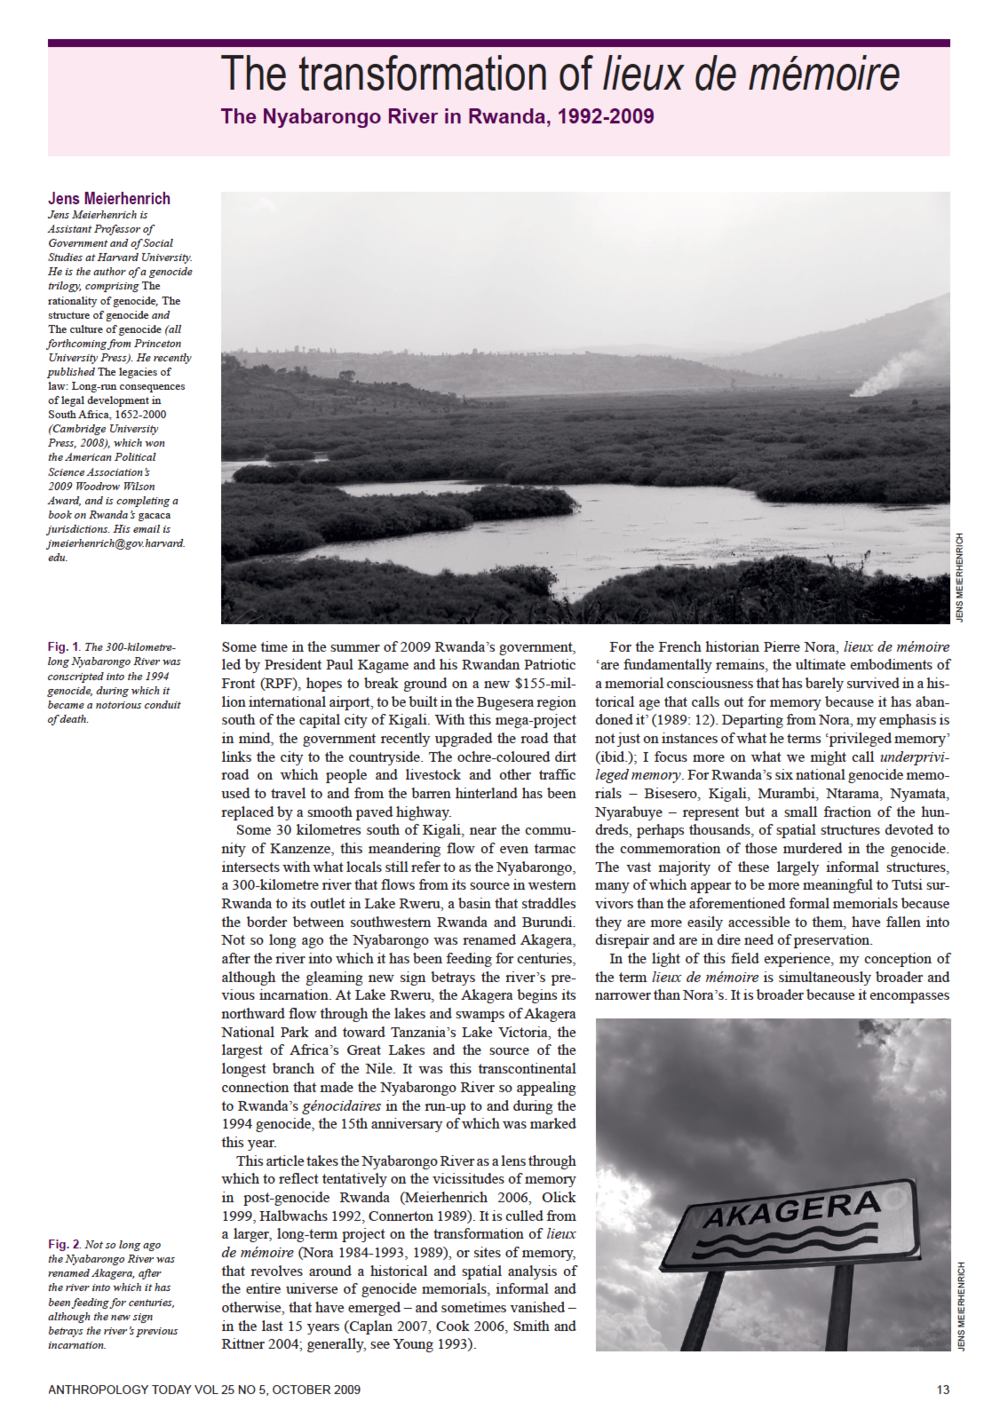 [4] Screen Shot, The Transformation of lieux de memoire [2009].png